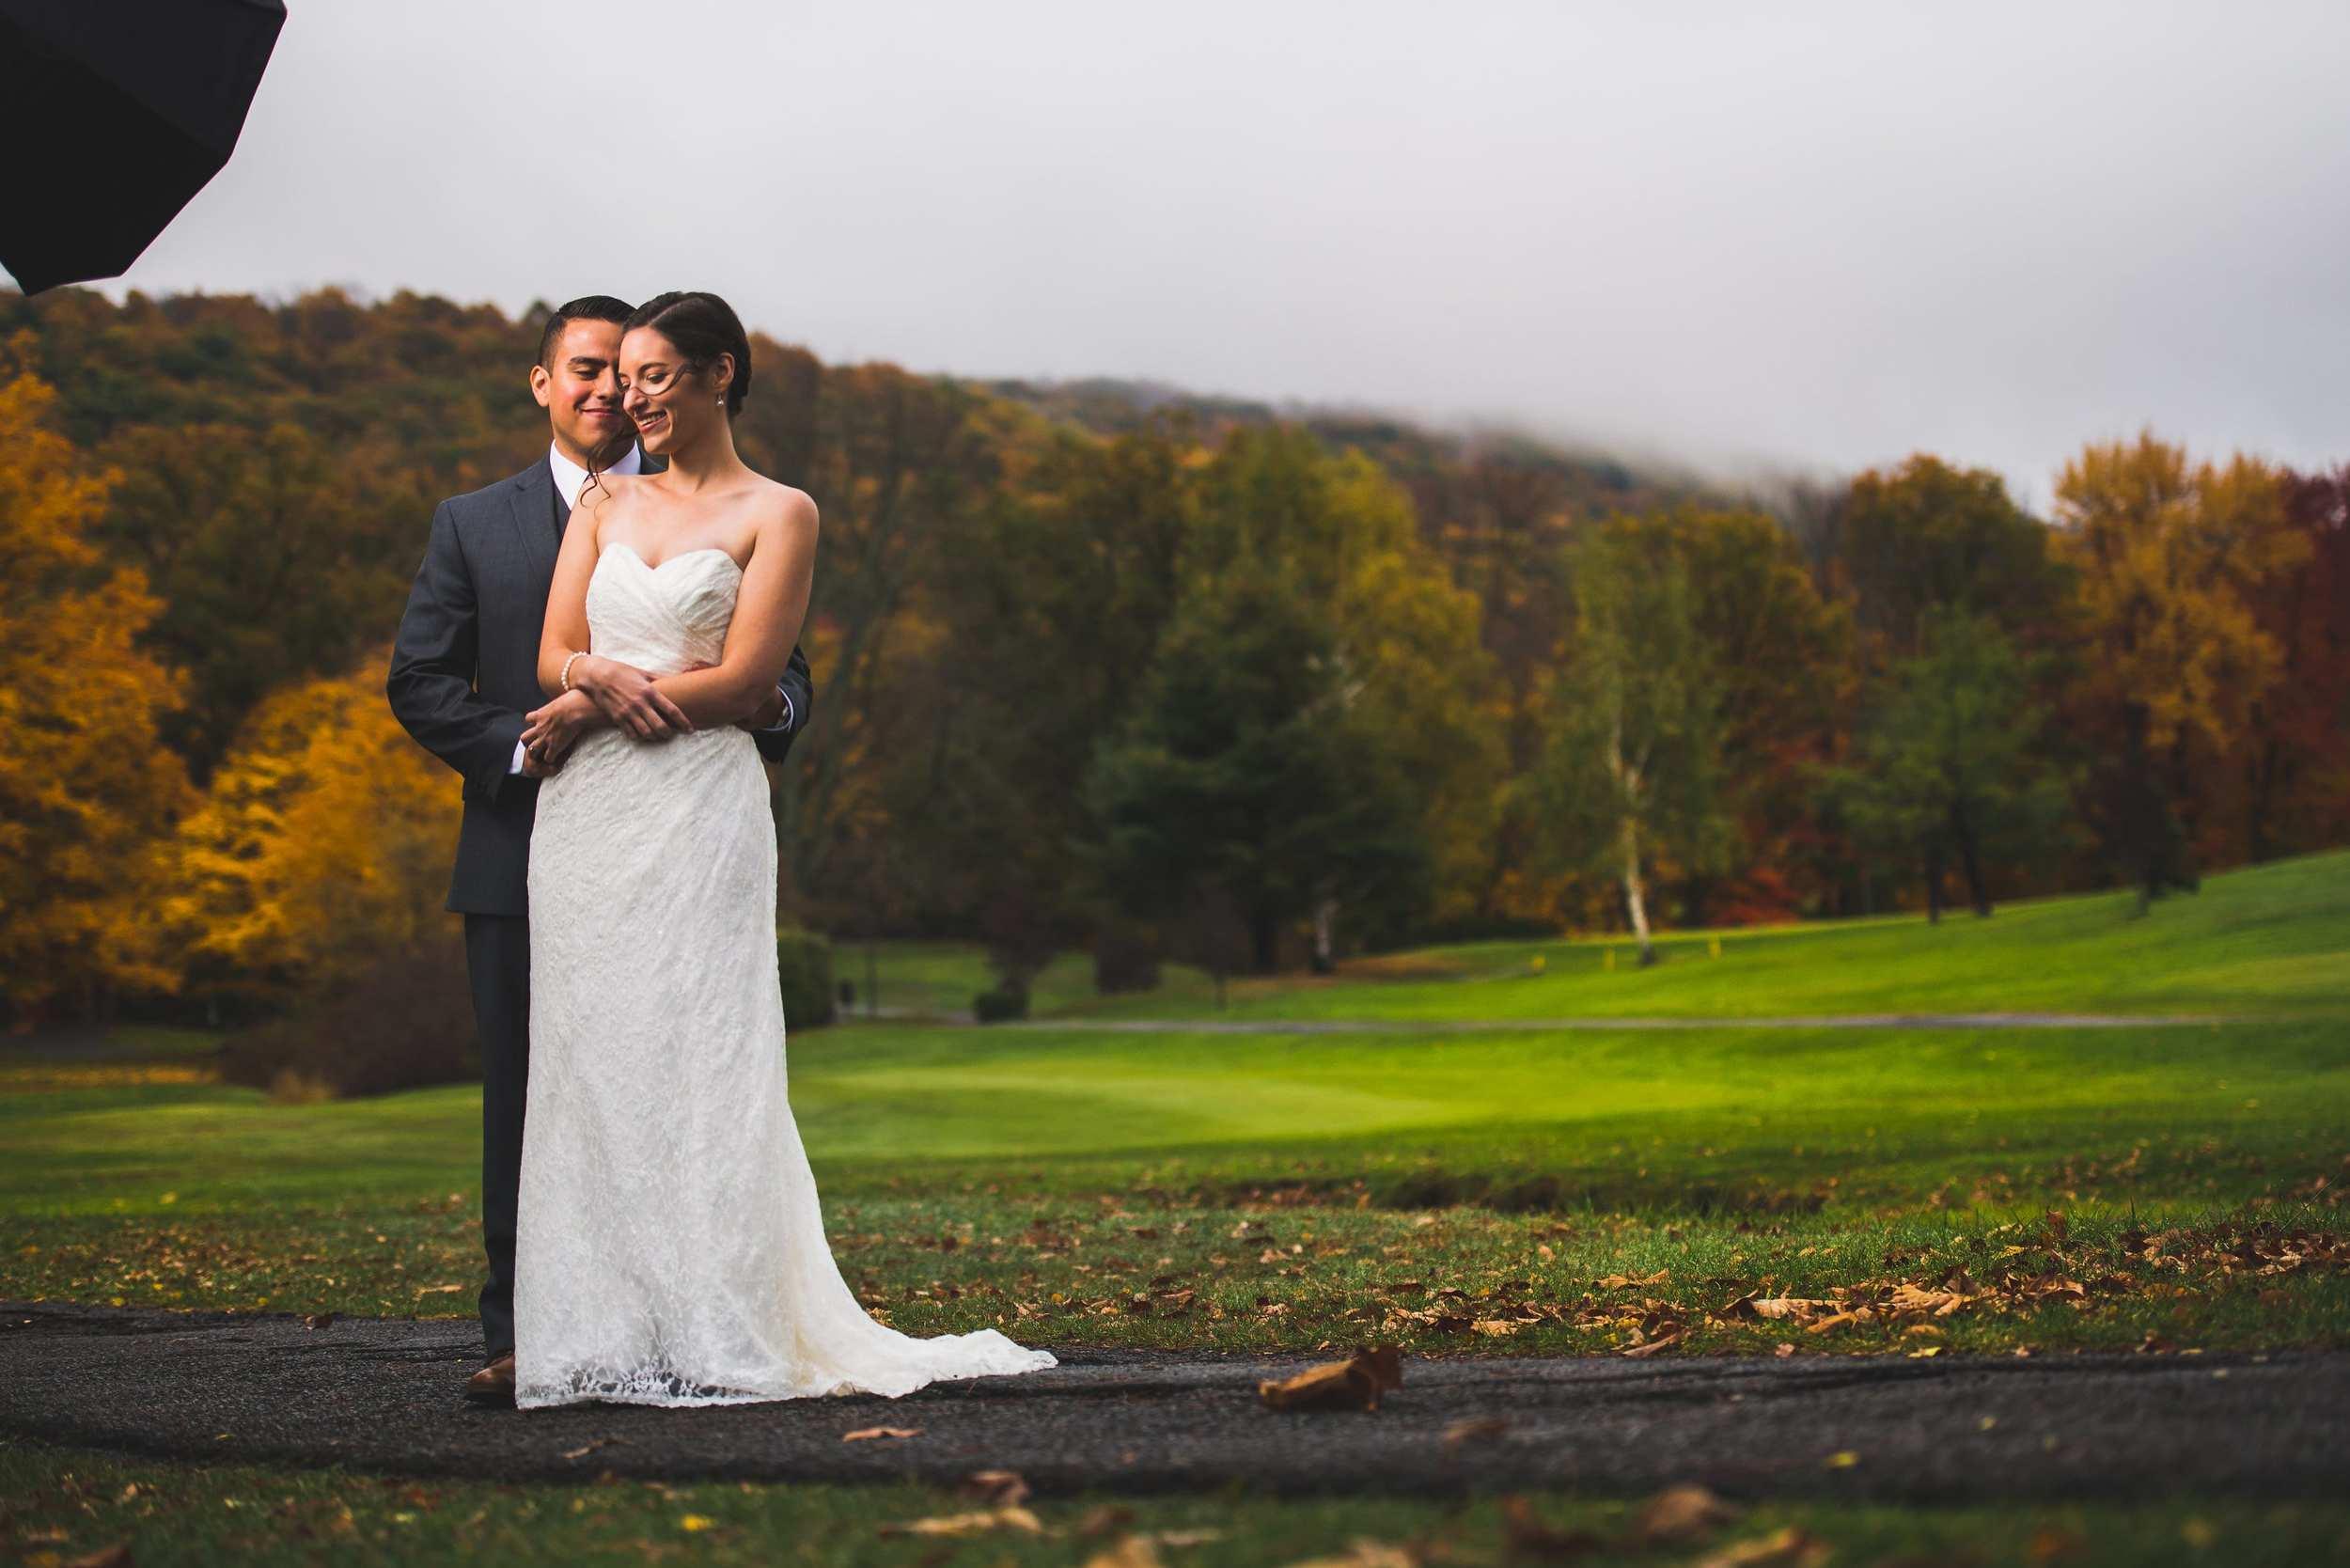 New-York-Wedding-Photographer-Falkirk-Wedding(105of163)-min.jpg